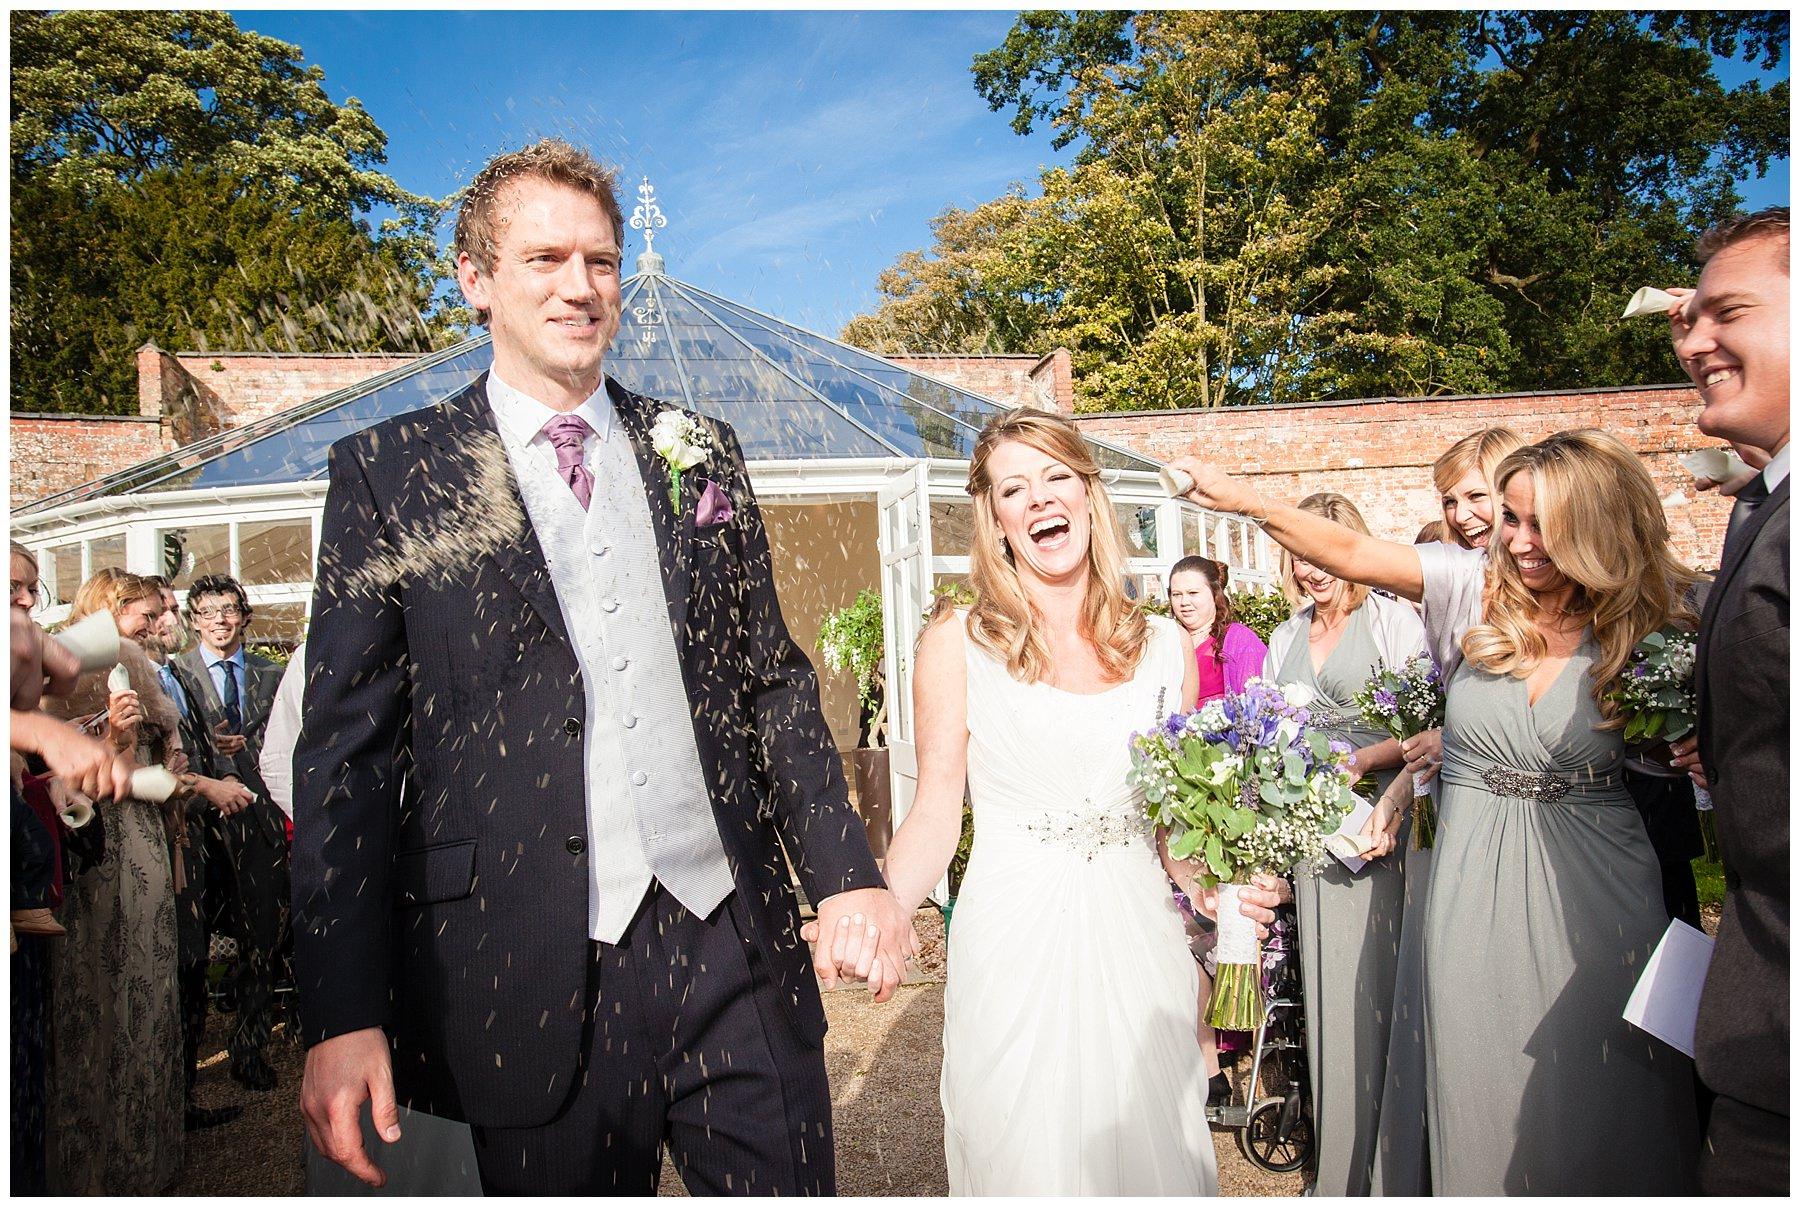 autumn combermere abbey with glasshouse confetti shot - wedding photographer shropshire